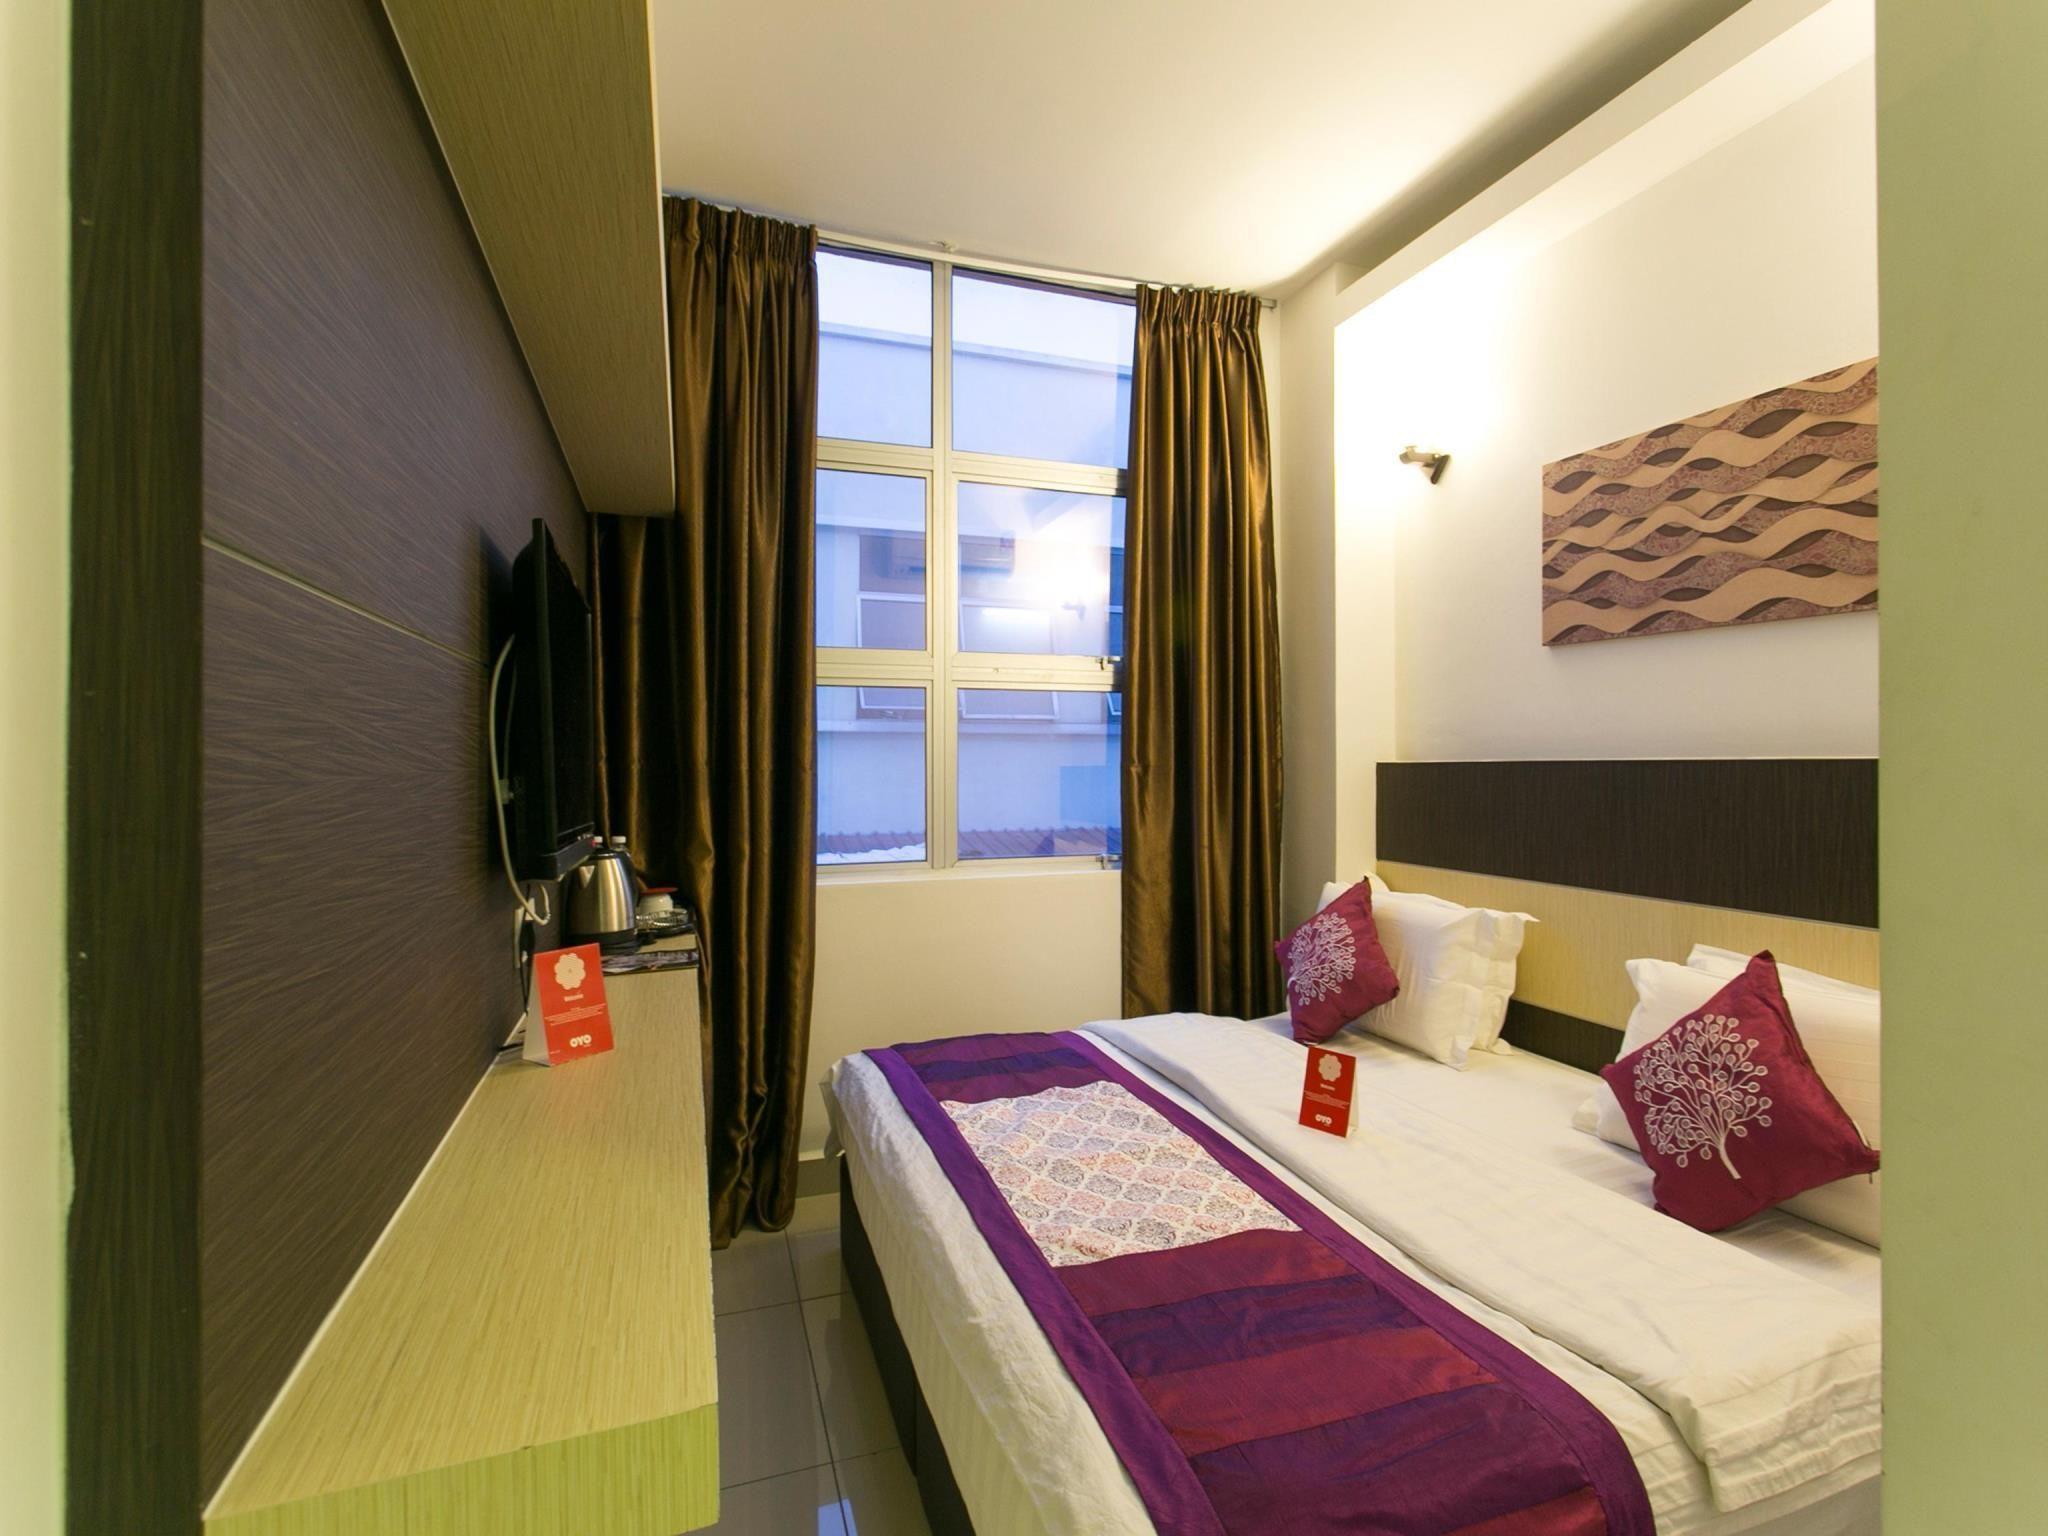 Oyo Rooms Uptown Avenue Seremban 2 Seremban Malaysia Seremban Room Home Decor